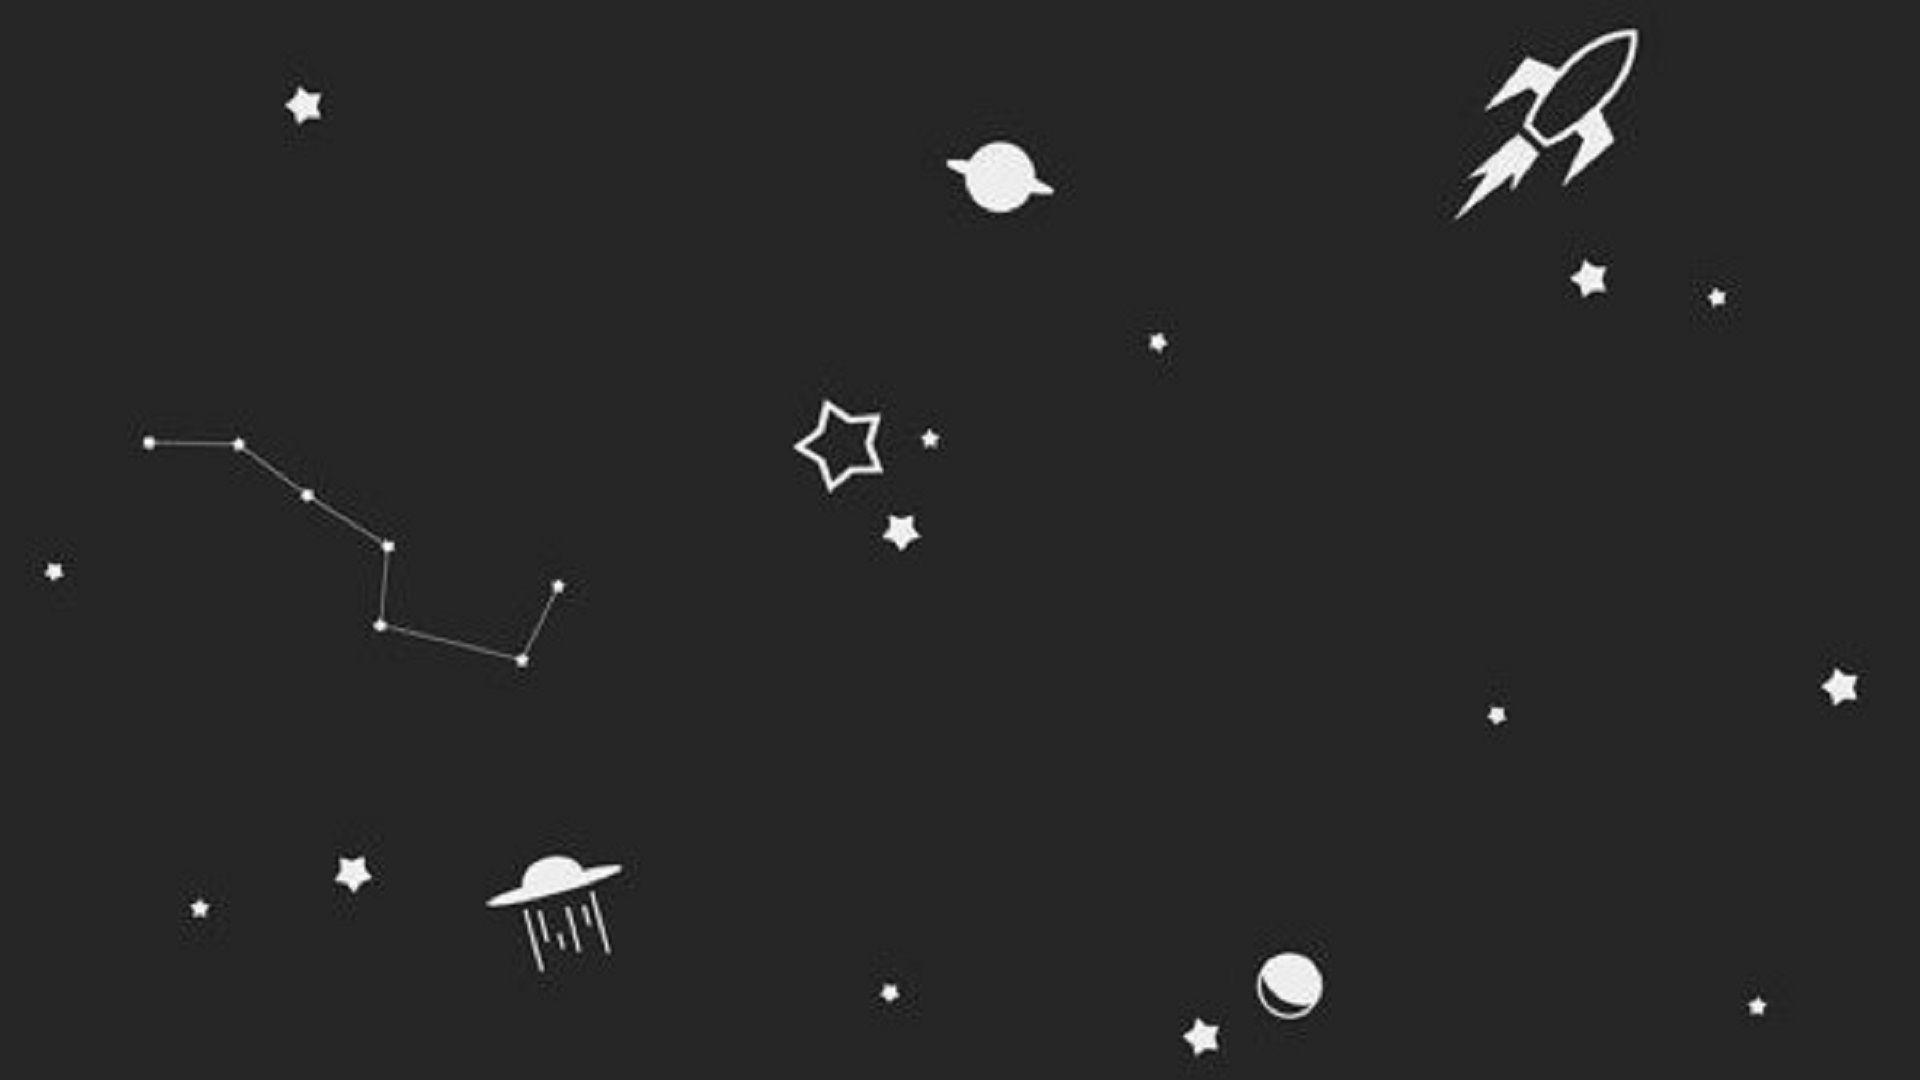 Aesthetic Desktop Tumblr Wallpaper Laptop Unix Tumblr